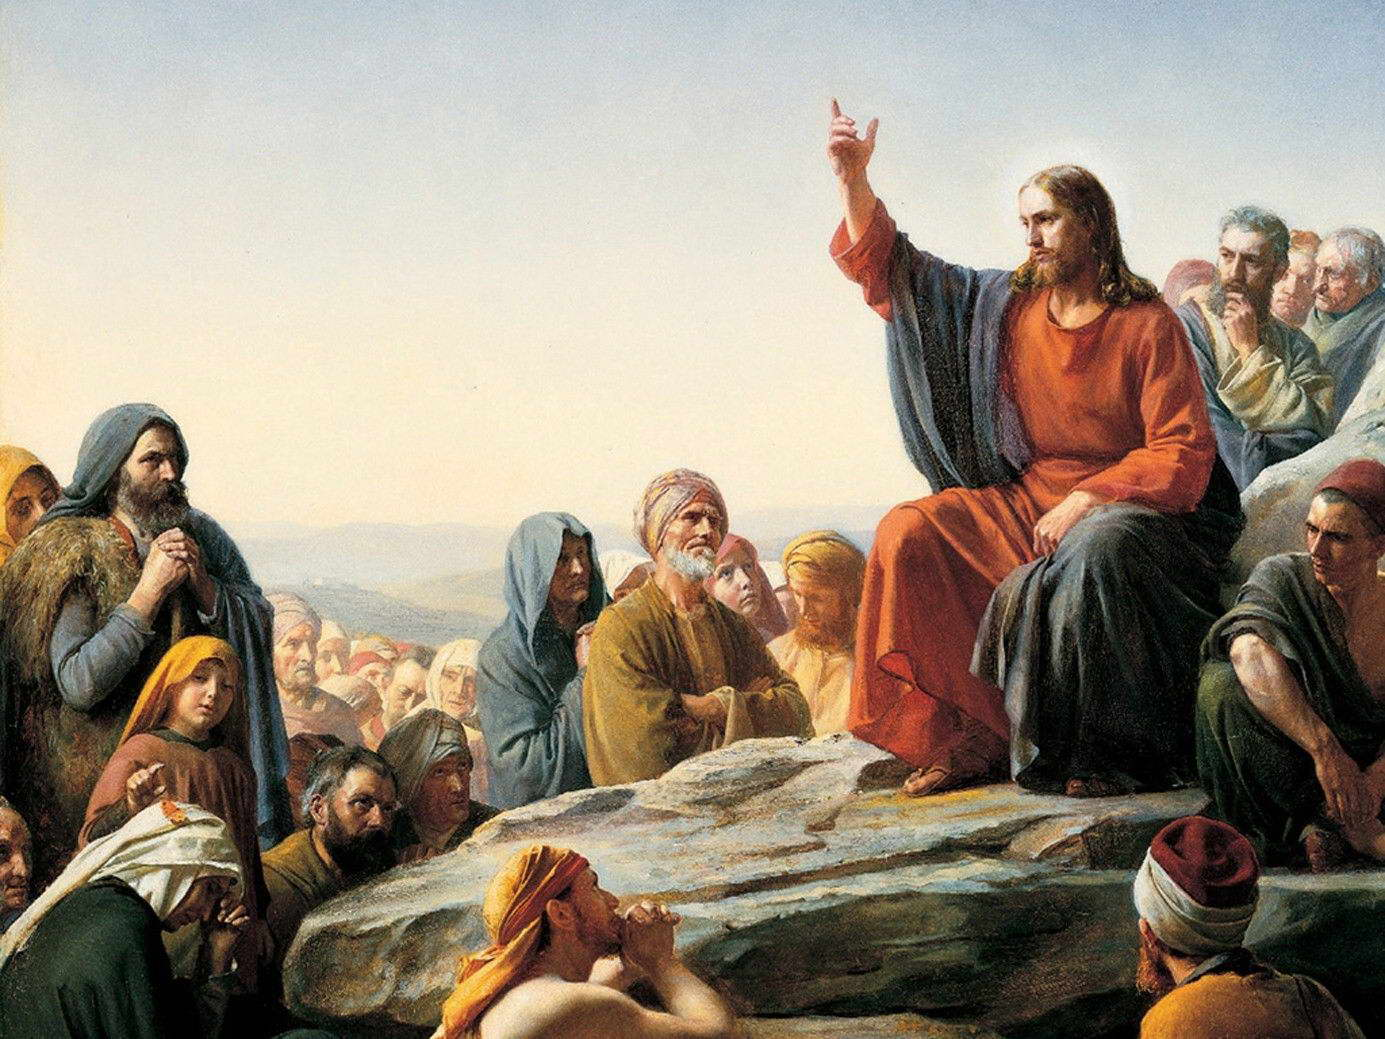 19614 Jesus Christ Lord Savior Wall Print POSTER CA